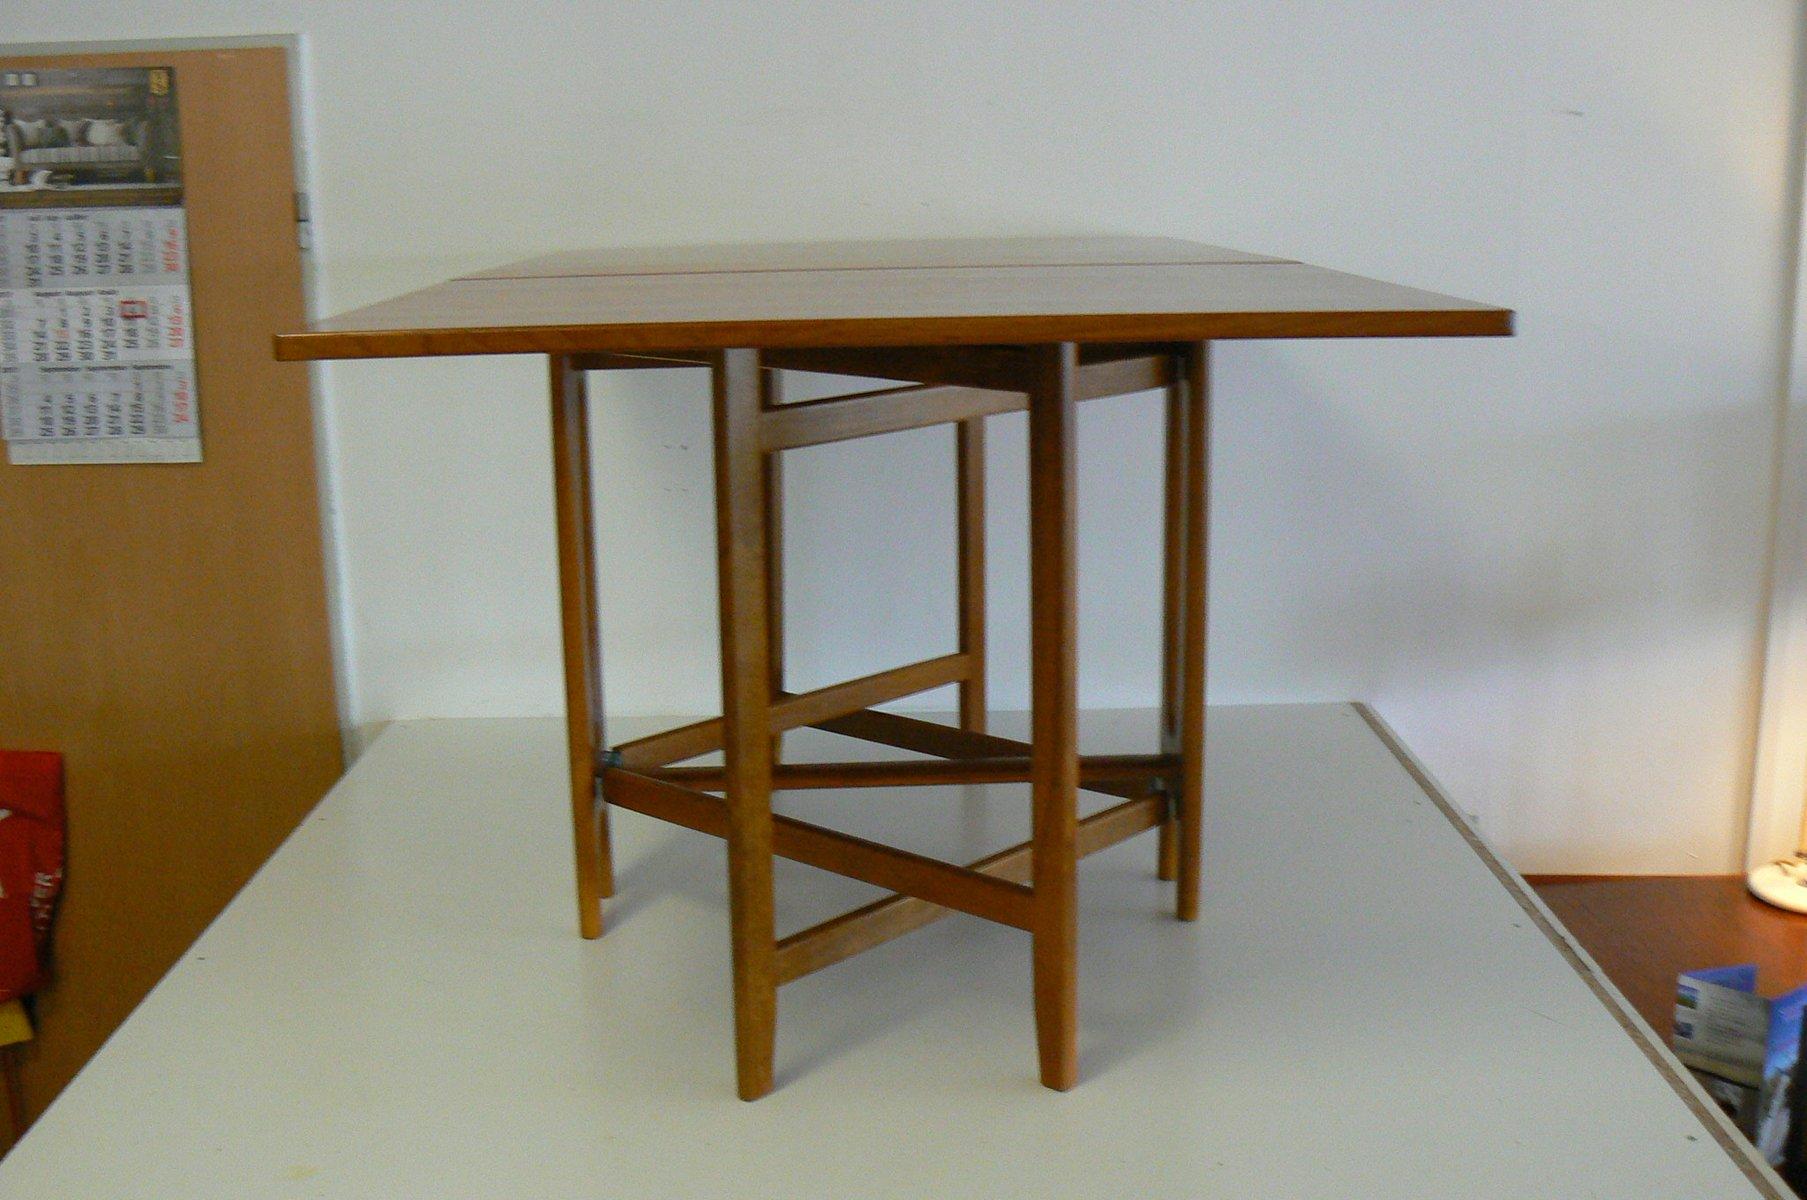 Vintage Folding Teak Dining Table by Bendt Winge for  : vintage folding teak dining table by bendt winge for kleppe mobelfabrikk 1 from www.pamono.com size 1807 x 1200 jpeg 141kB